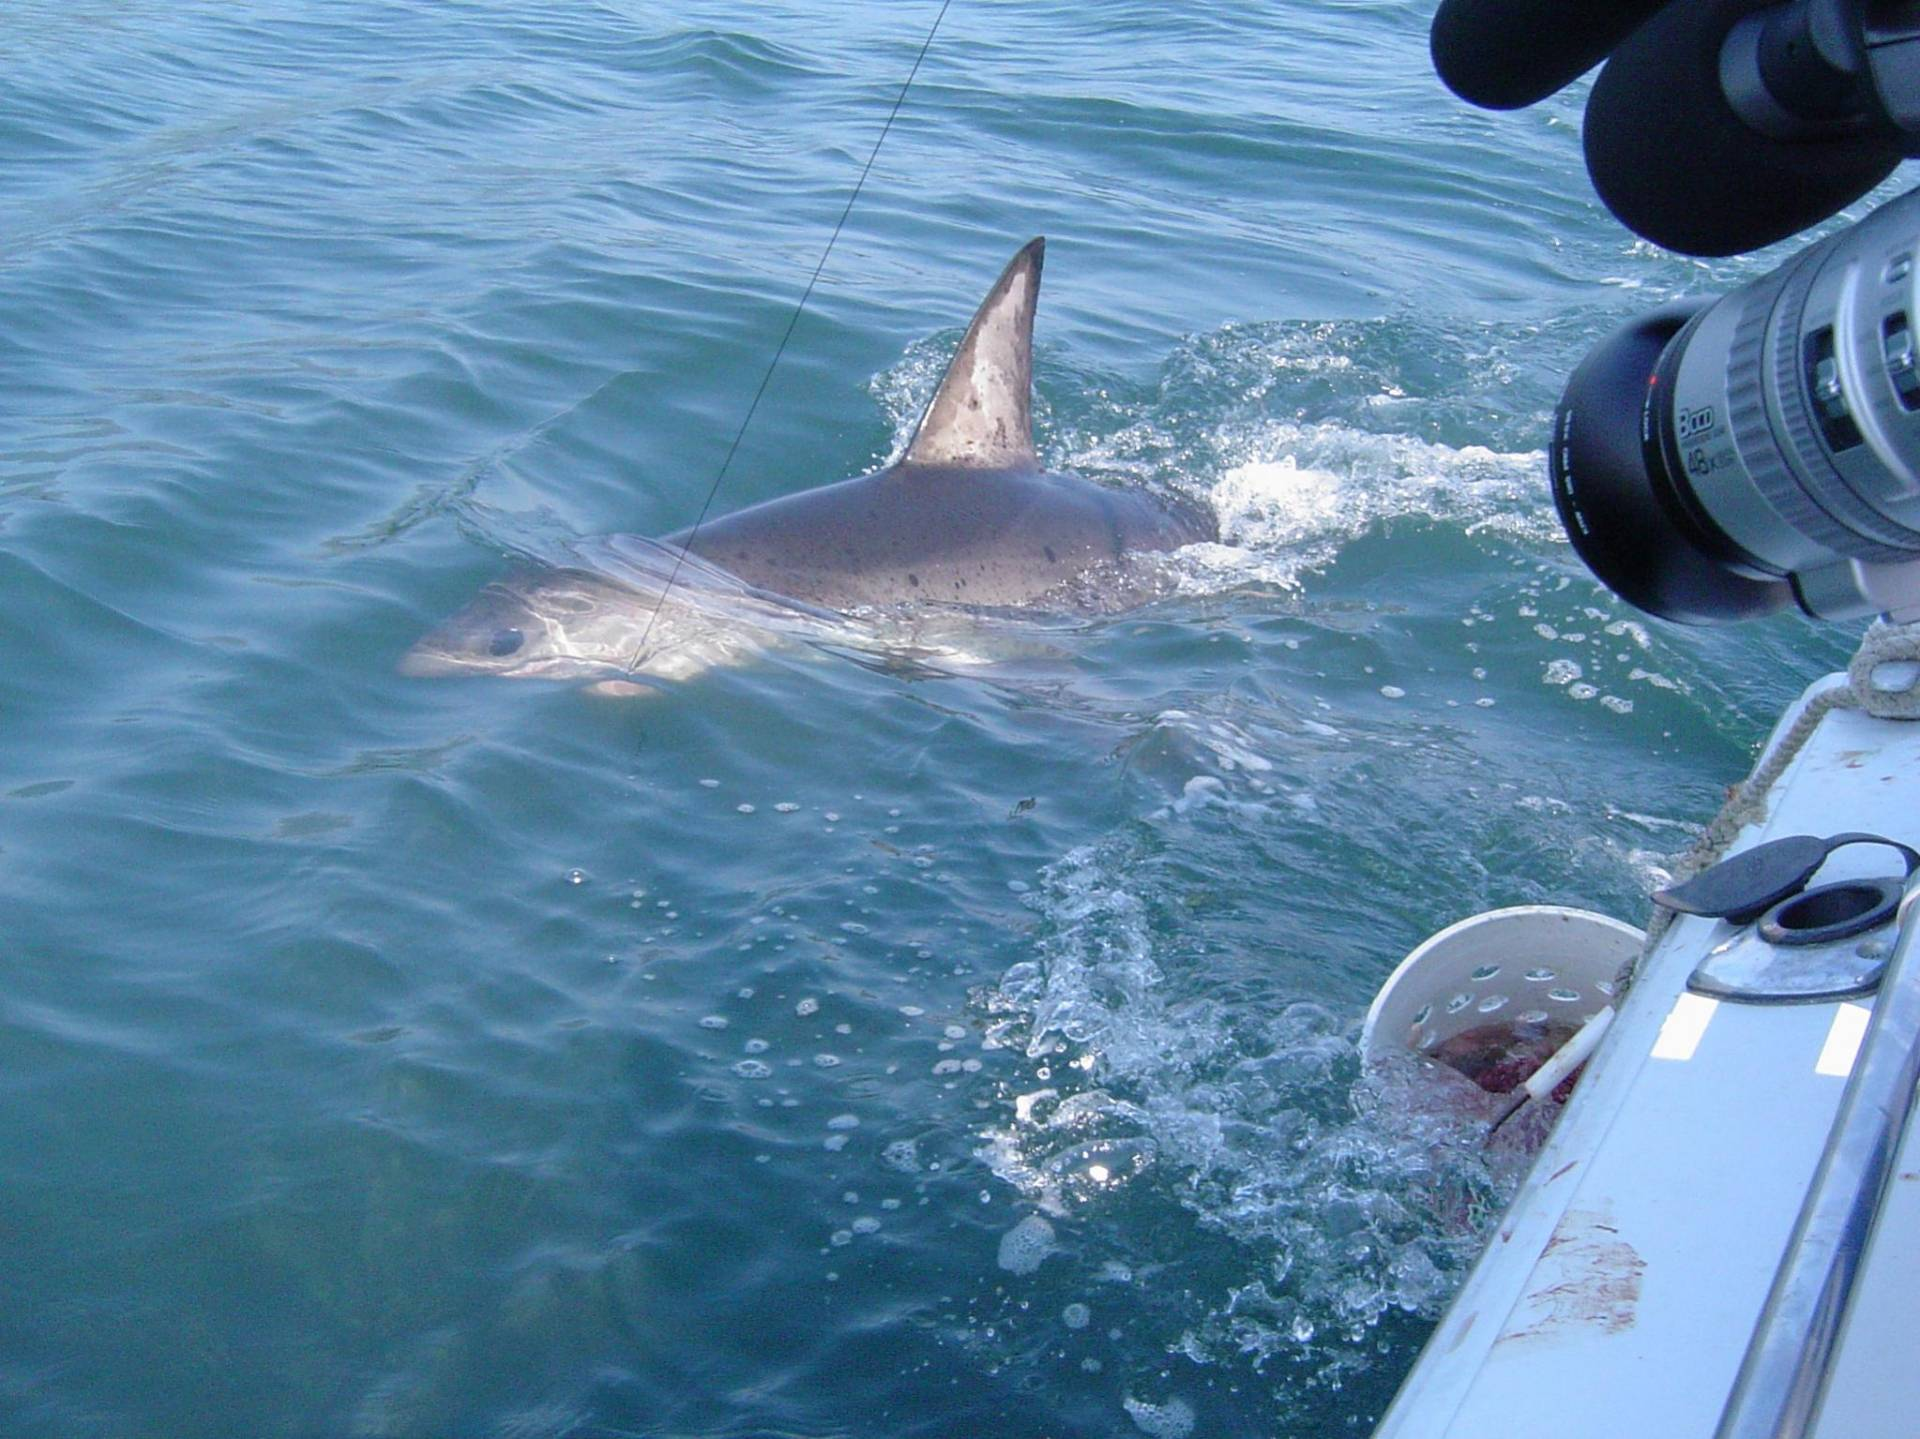 New 2011 california fishing licenses suck bloodydecks for Fishing without a license california